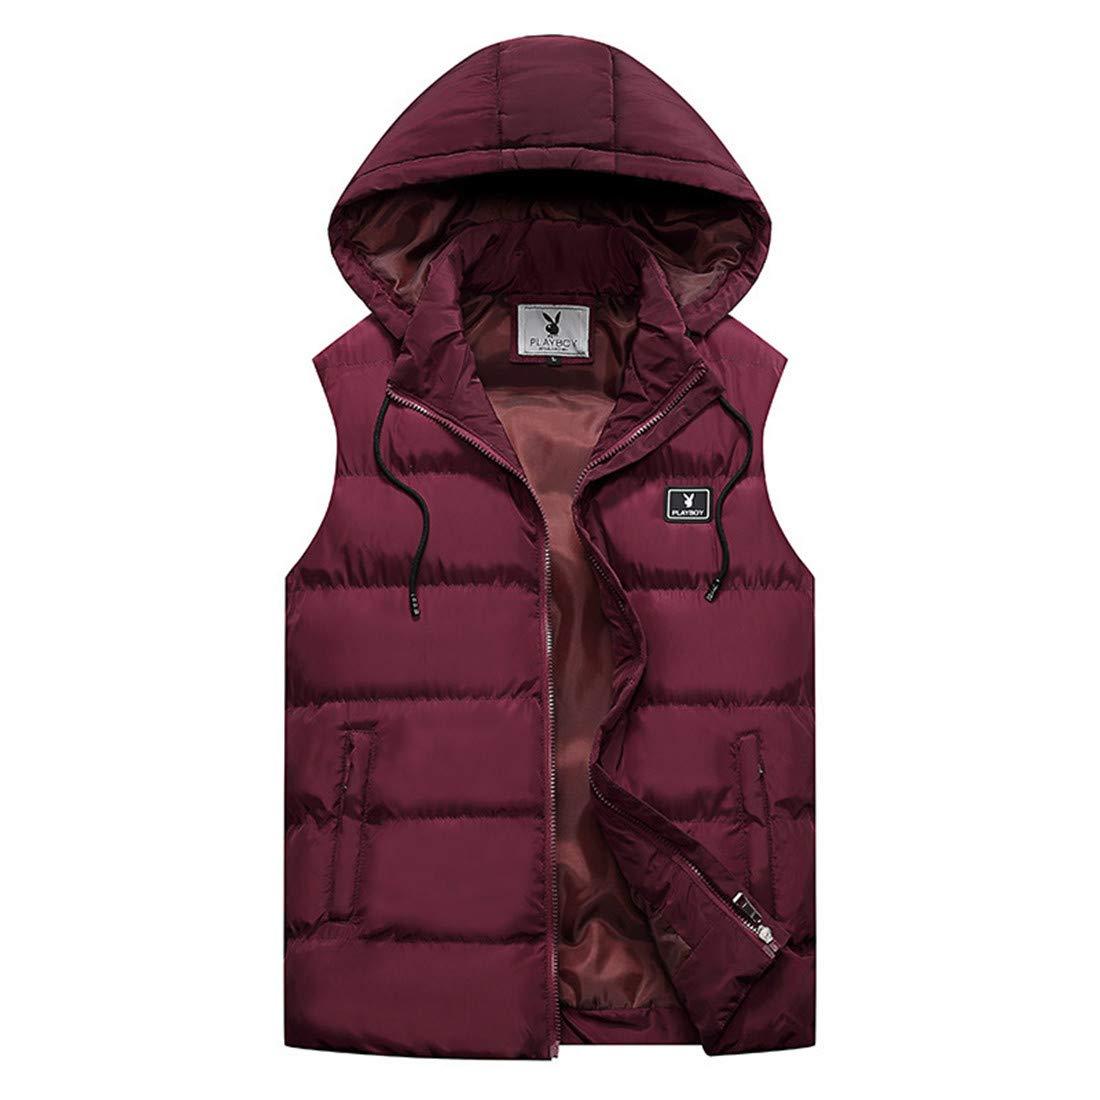 CAI&HONG-GUO GCH Baumwollkleidung Weste vielseitiger Mantel